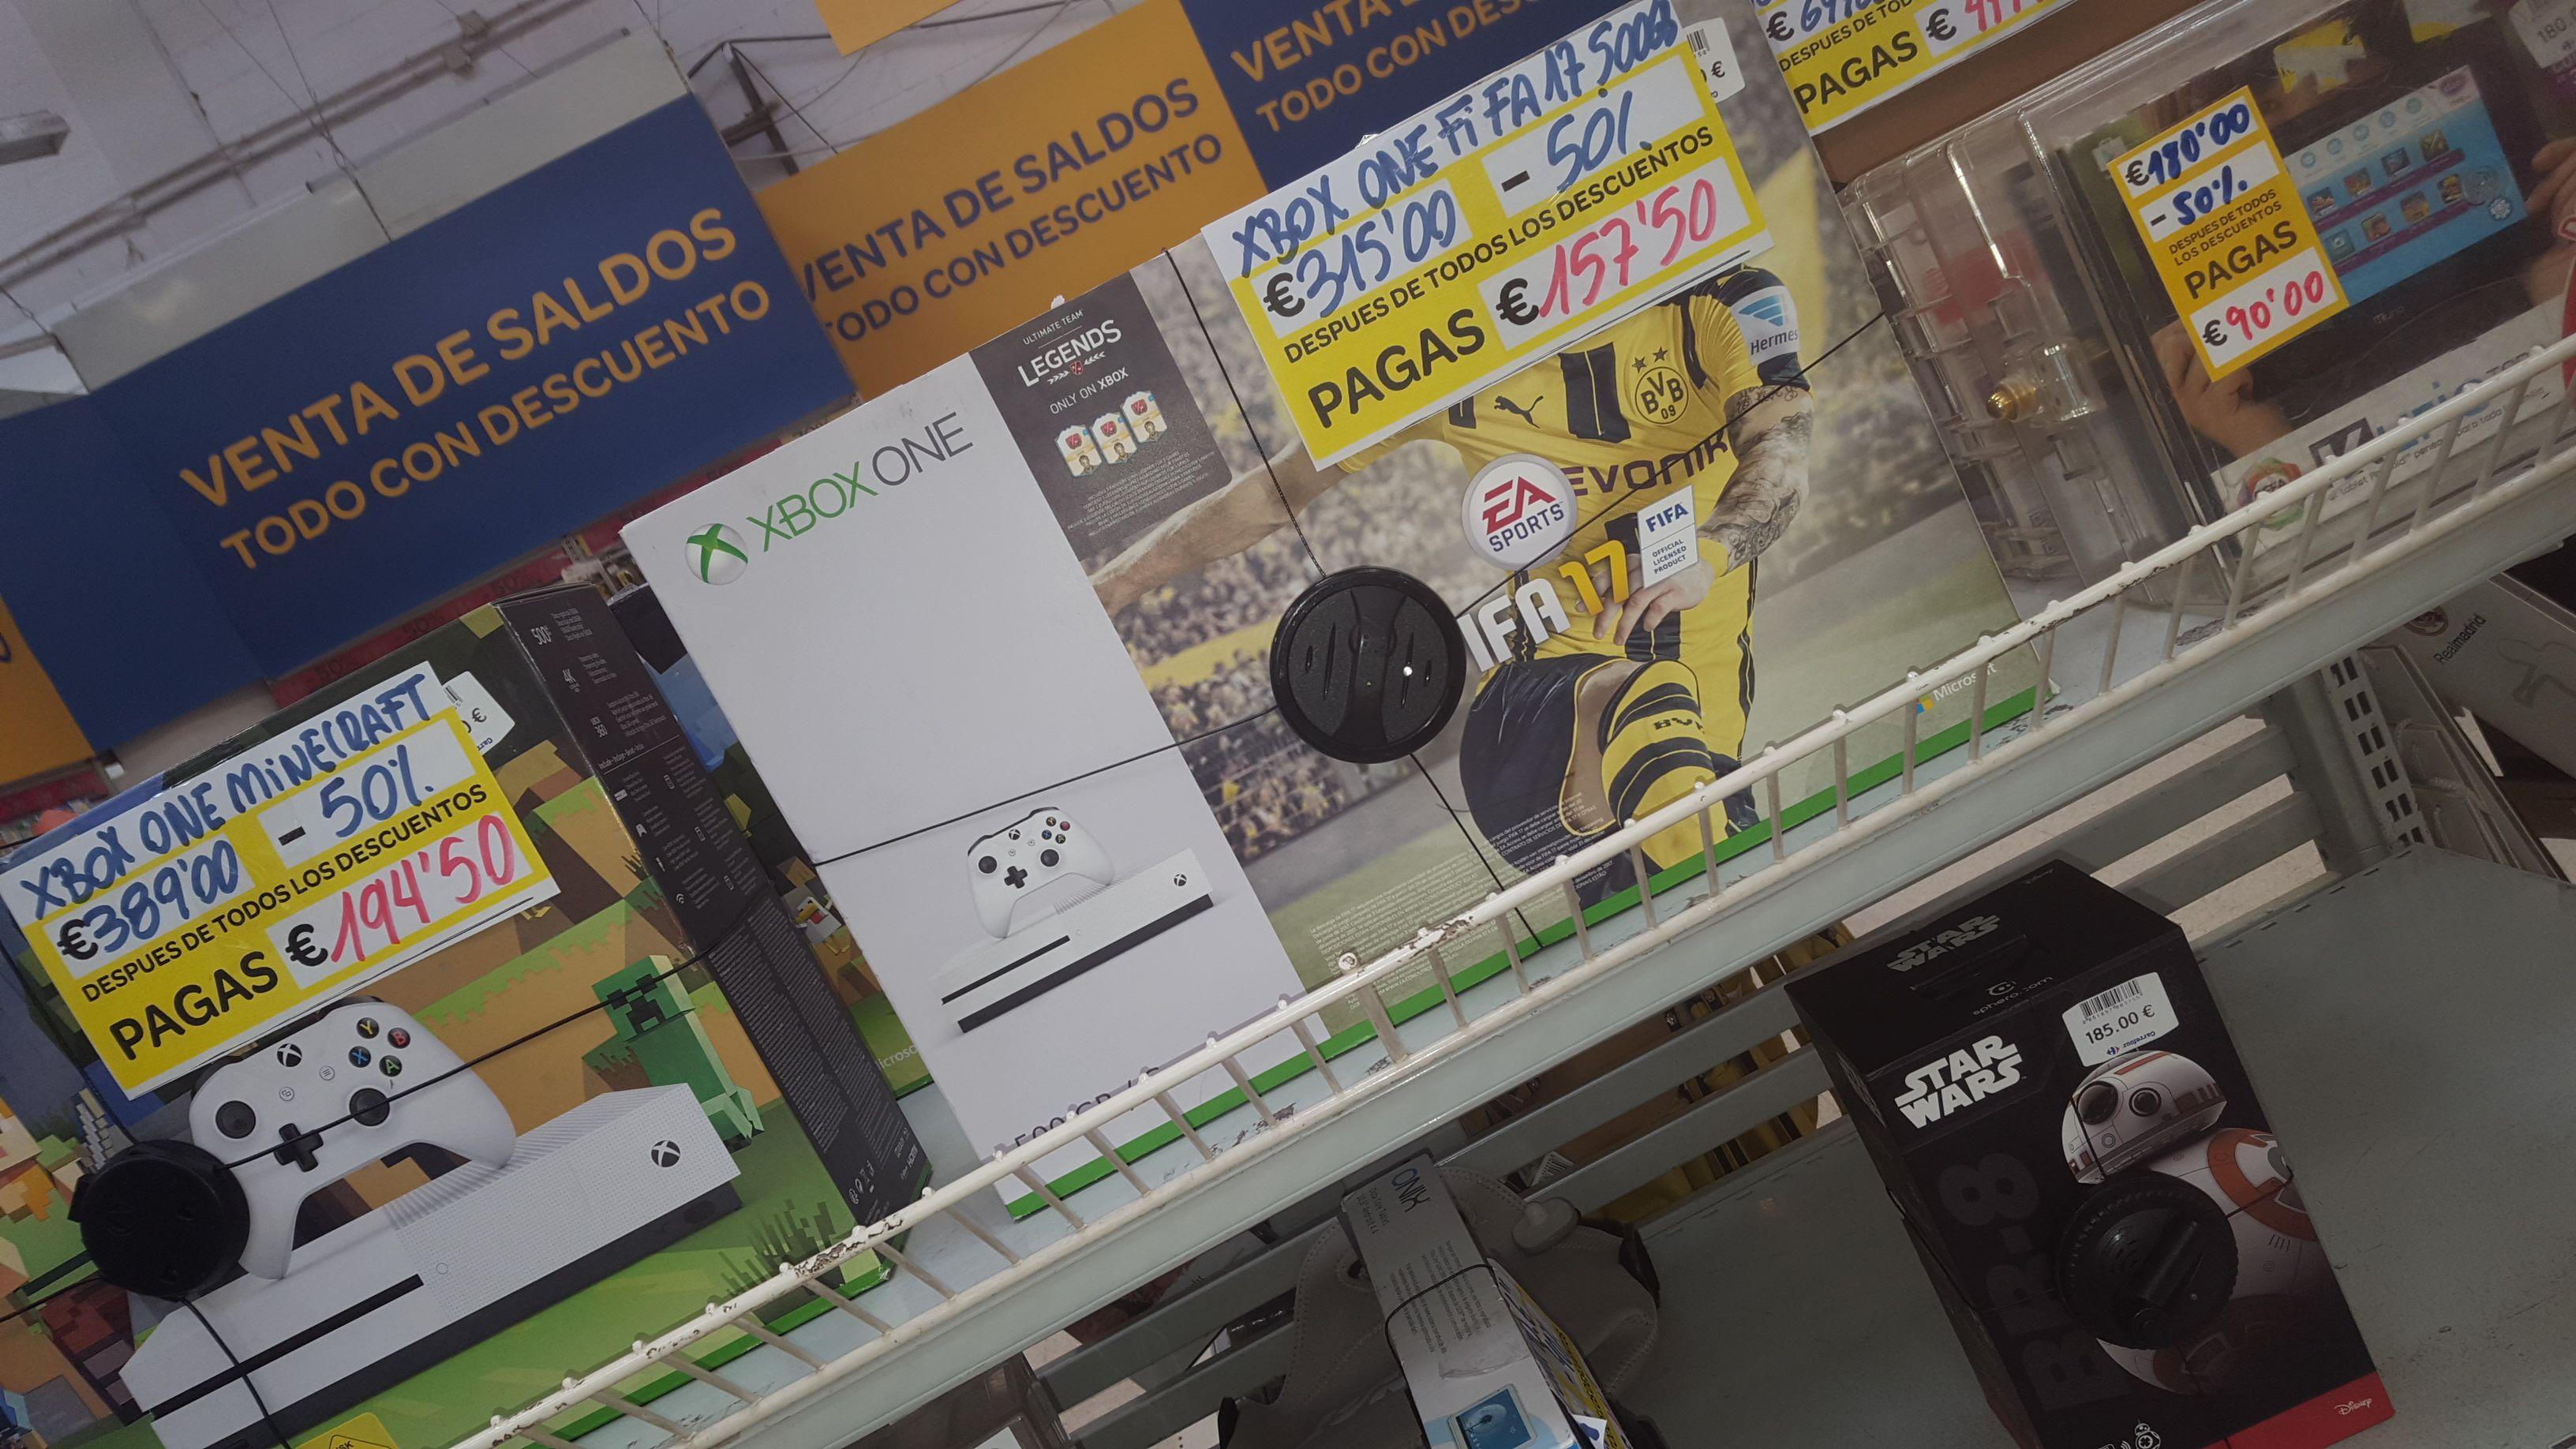 XBOX ONE 500GB DOS HERMANAS (SEVILLA)